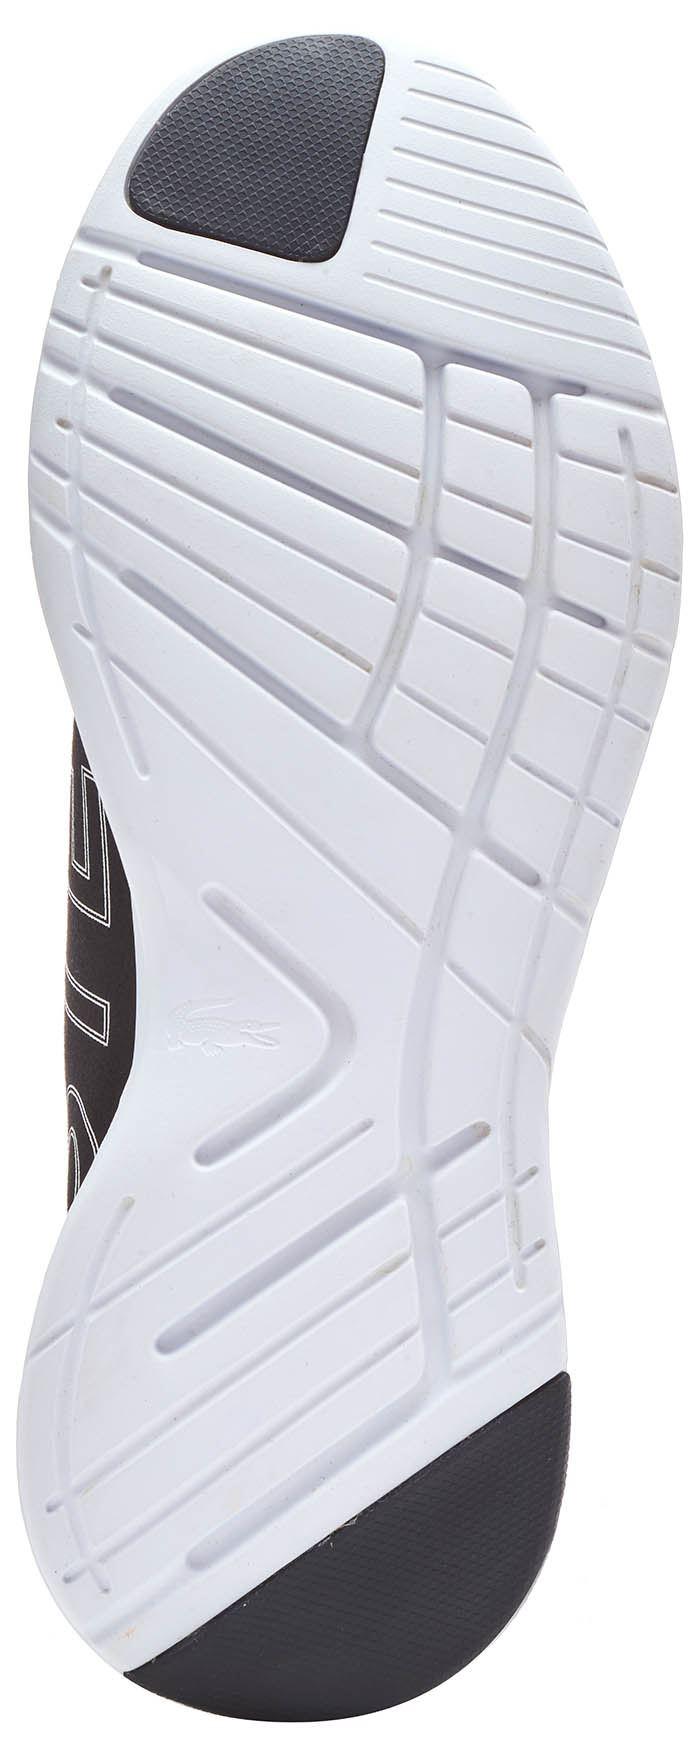 Lacoste Fit 119 1 LT LT LT SMA Lacci Running Scarpe da ginnastica alla moda in Nero & Navy blu 9910a4